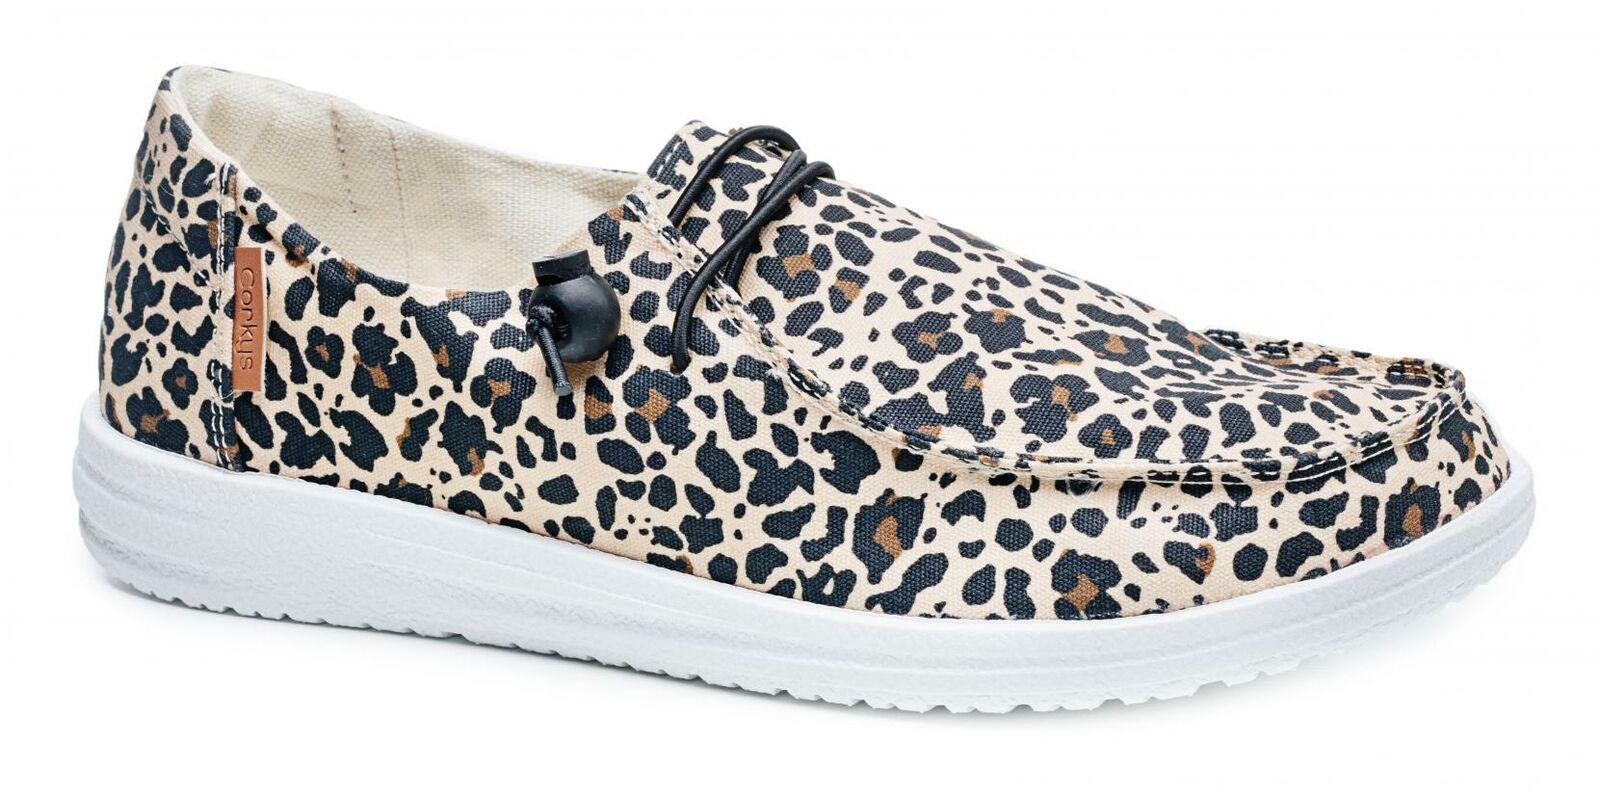 Corkys Womens Kayak Casual Slip On Sneakers, Leopard